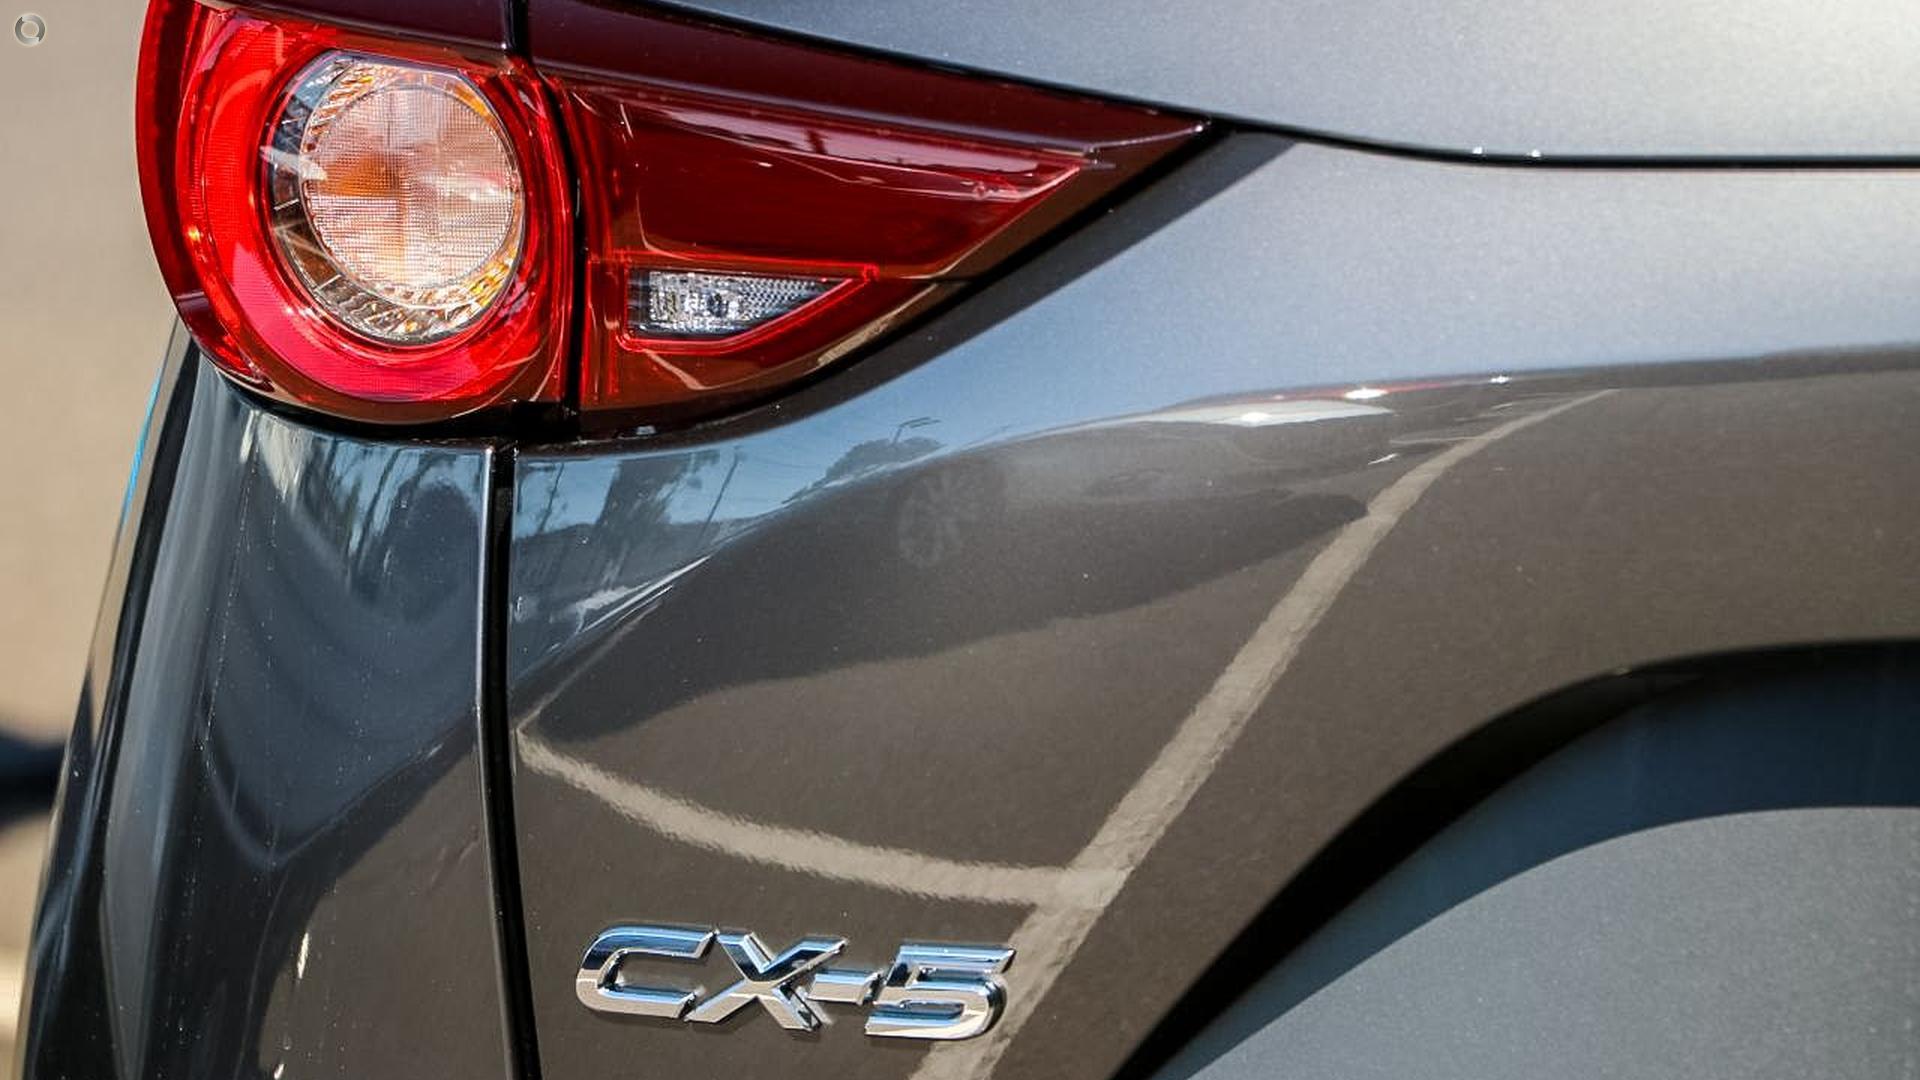 2018 Mazda Cx-5 Maxx KF Series